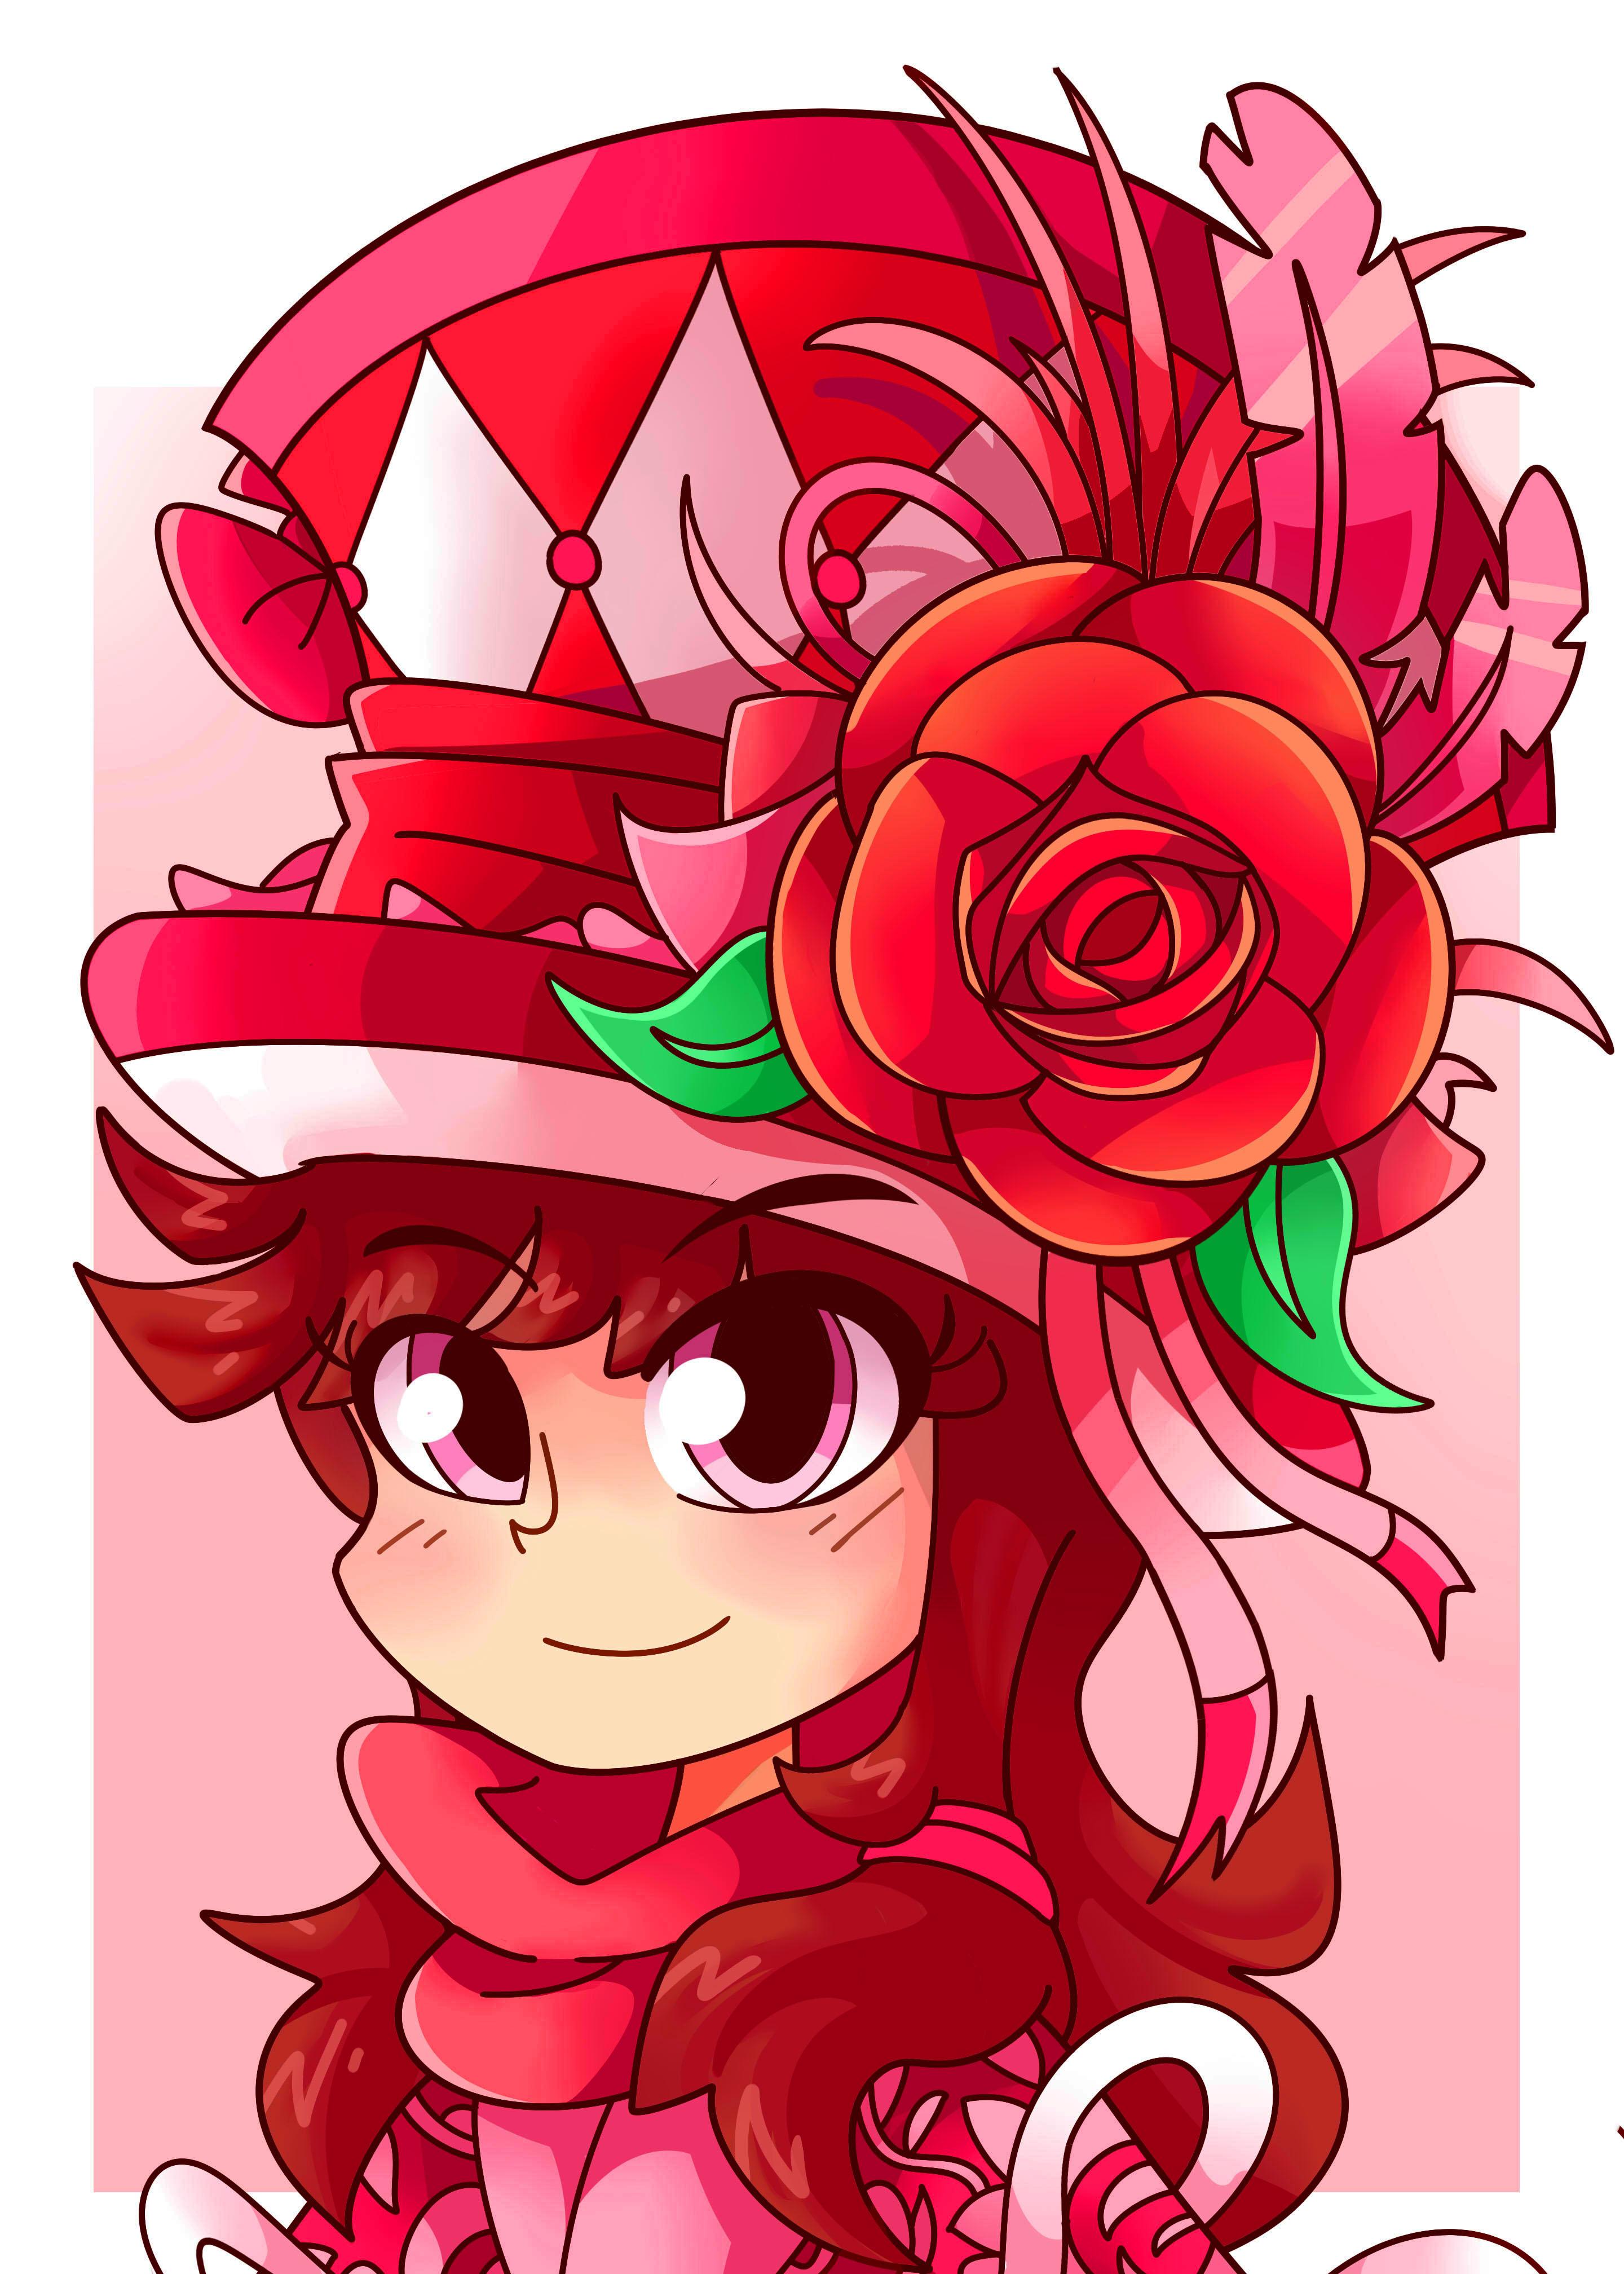 The Rose Hatter